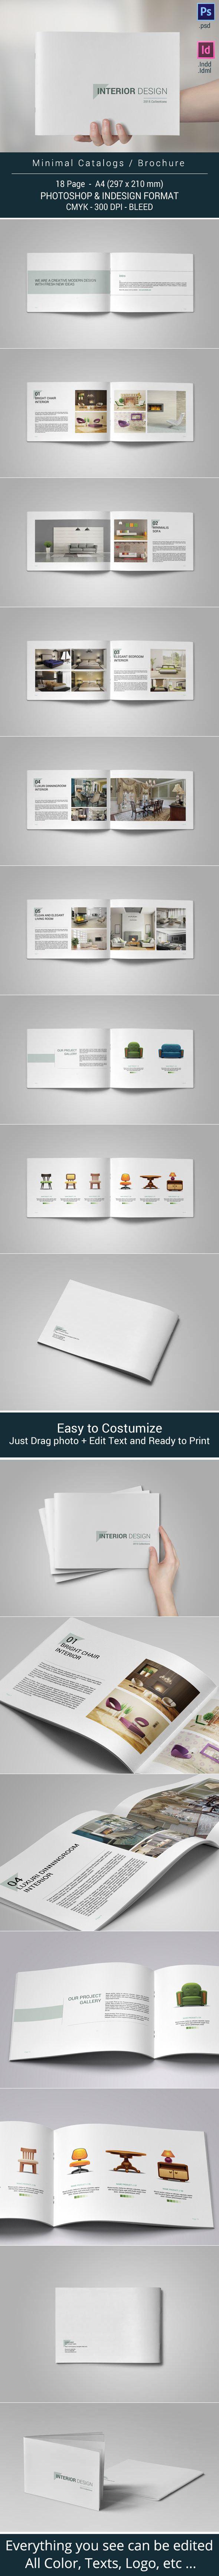 MINIMAL - Interior Design Brochure on Behance